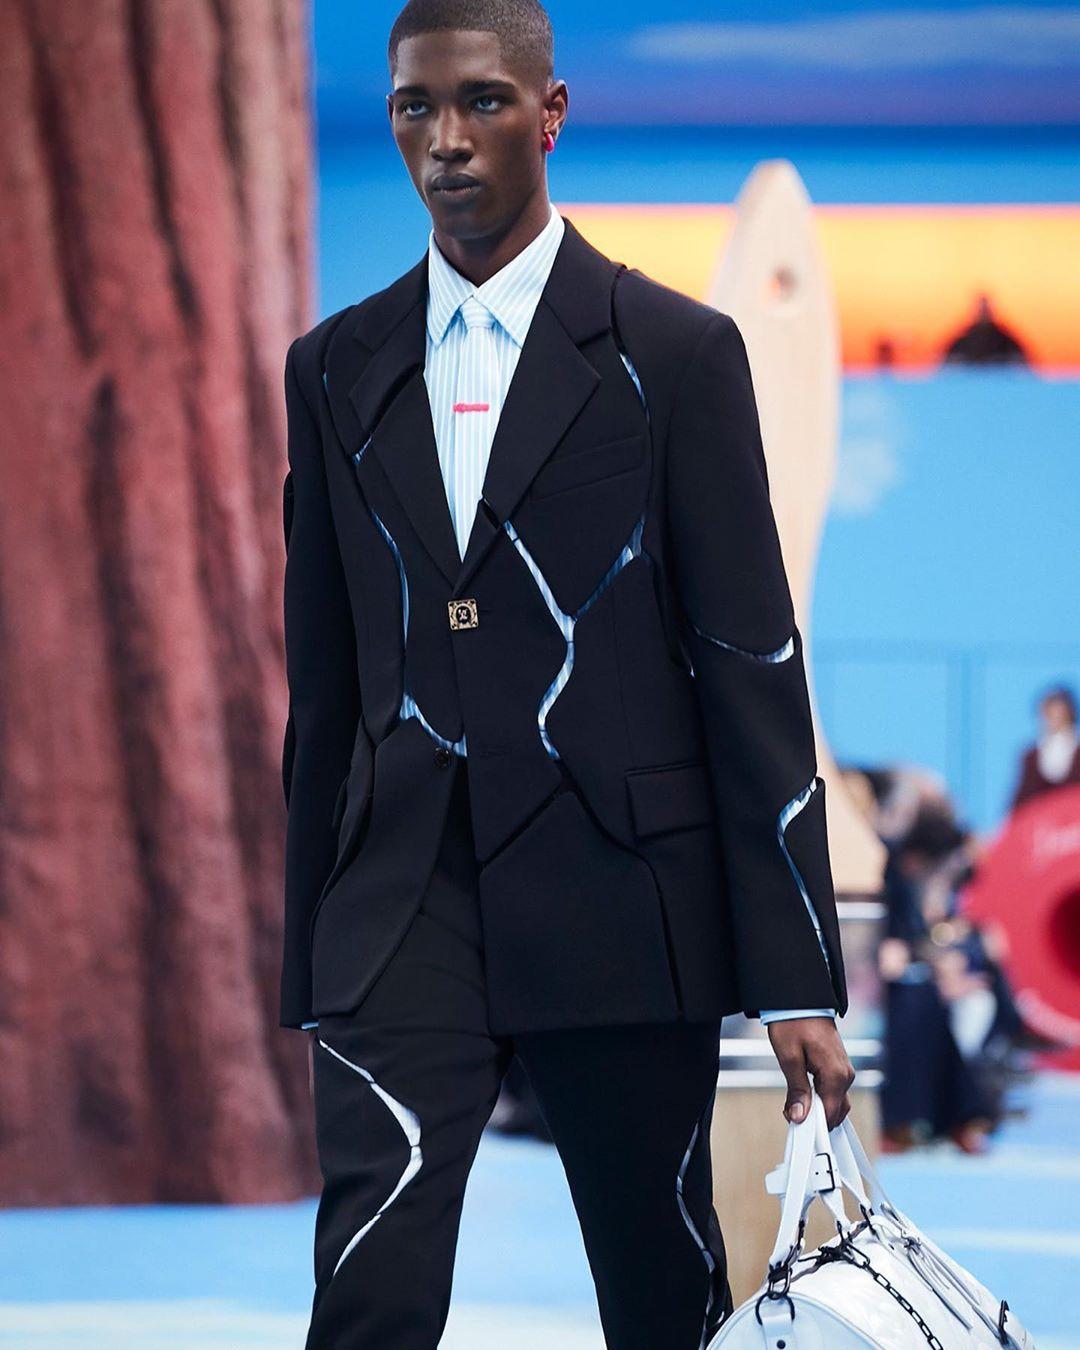 mannequin Louis Vuitton Paris Fashion Week 2020 PFW20